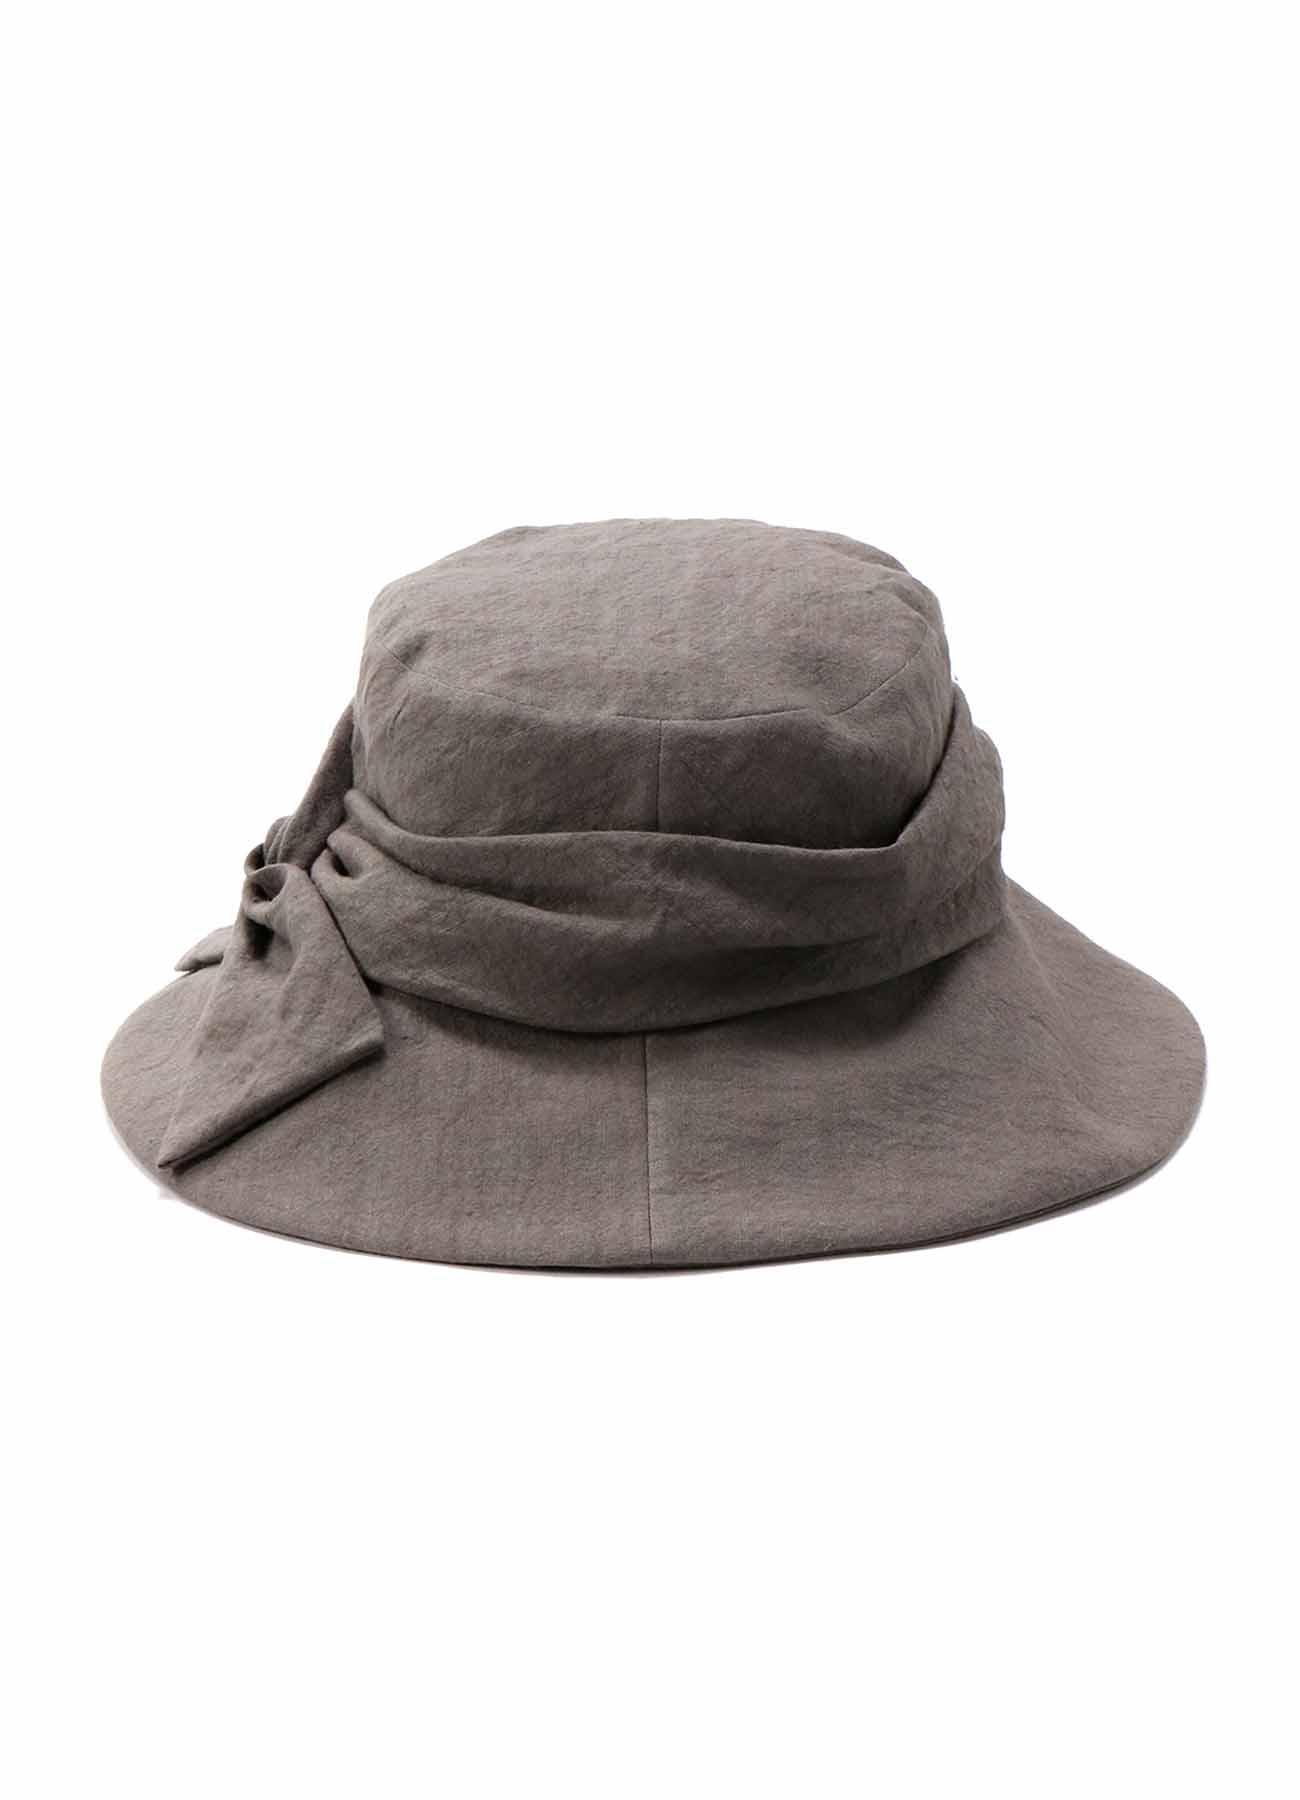 PLAIN WOVEN LINEN RIBBBON HAT